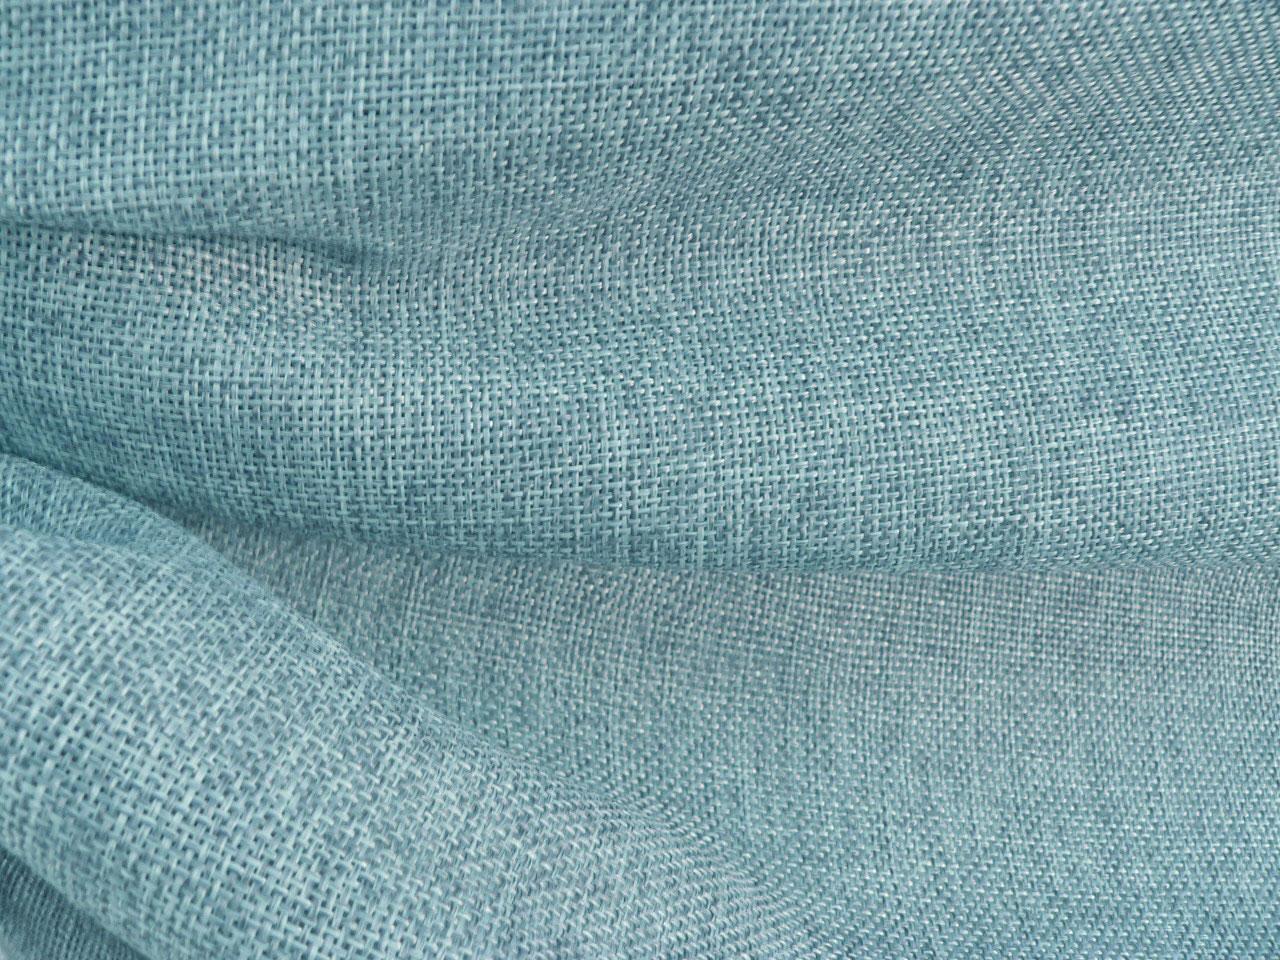 Vintage Linen Burlap Baby Blue Fabric Best Fabric Store